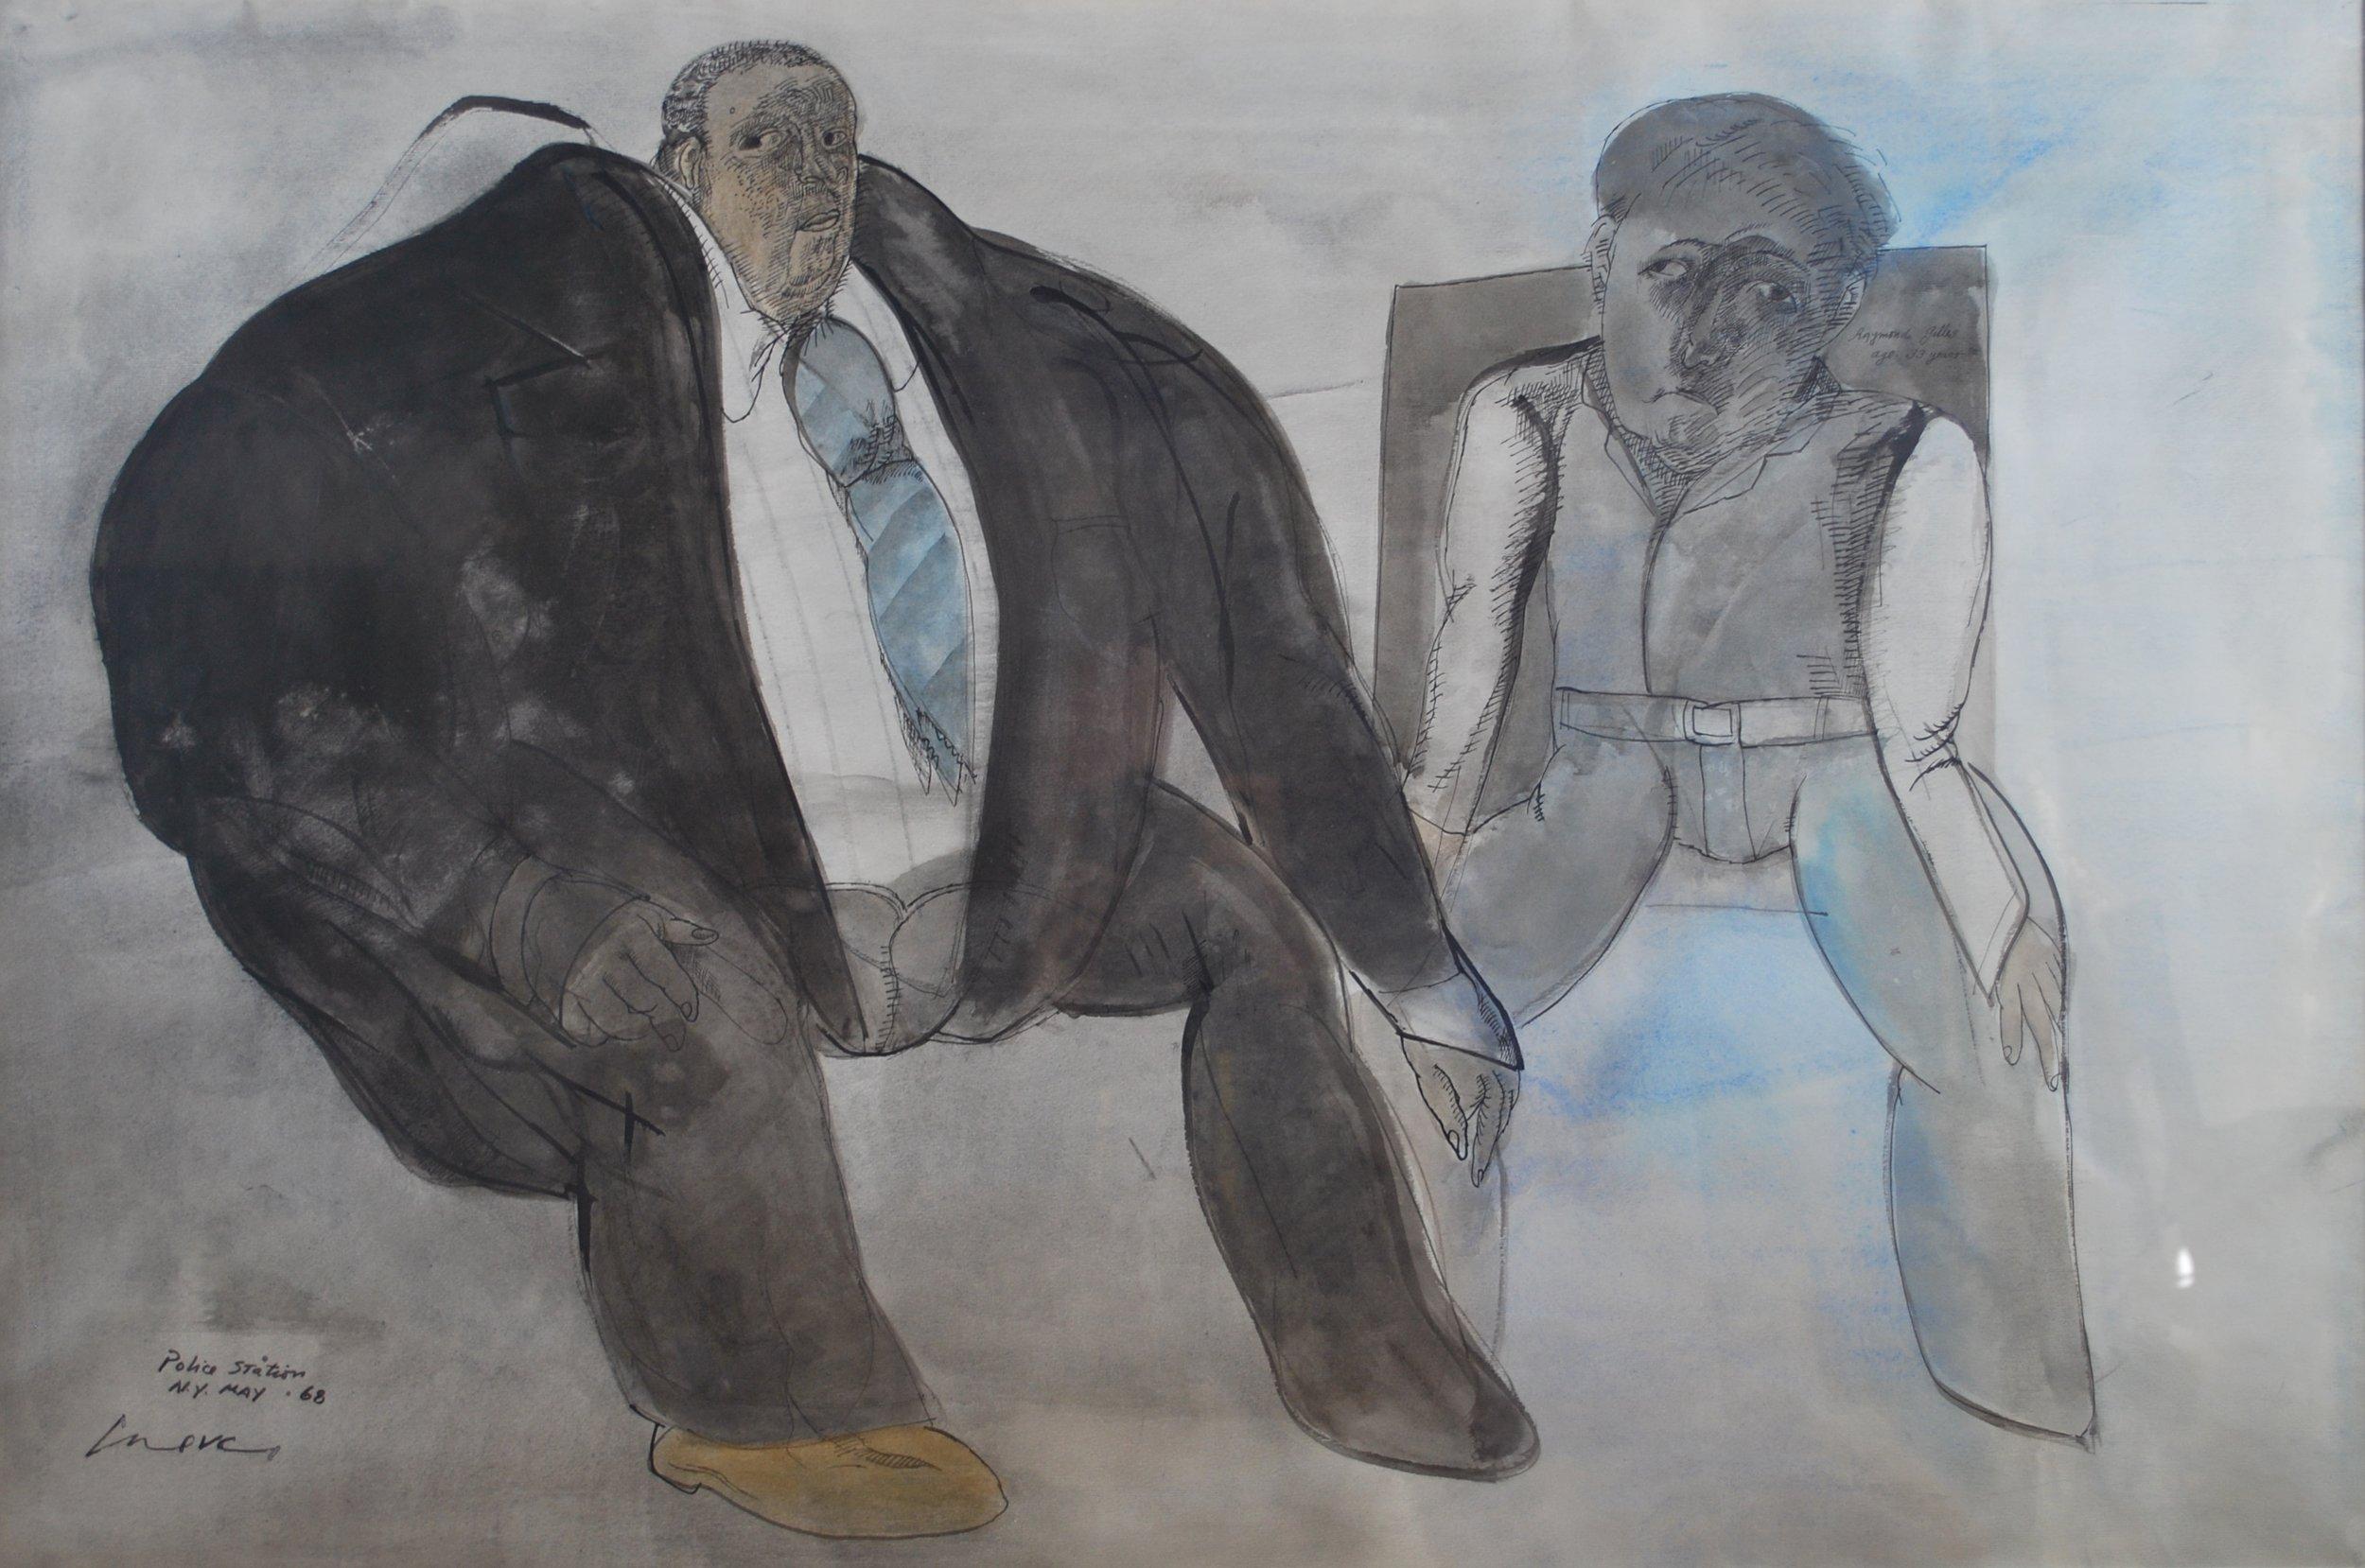 Jose Luis Cuevas  Title  Auto-retrato com José Gomez Sicre - Police Station - New York  Medium  Mix Medium on Paper  Date1968 Size 68 x 99 Courtesy of Bond Latin Gallery.JPG